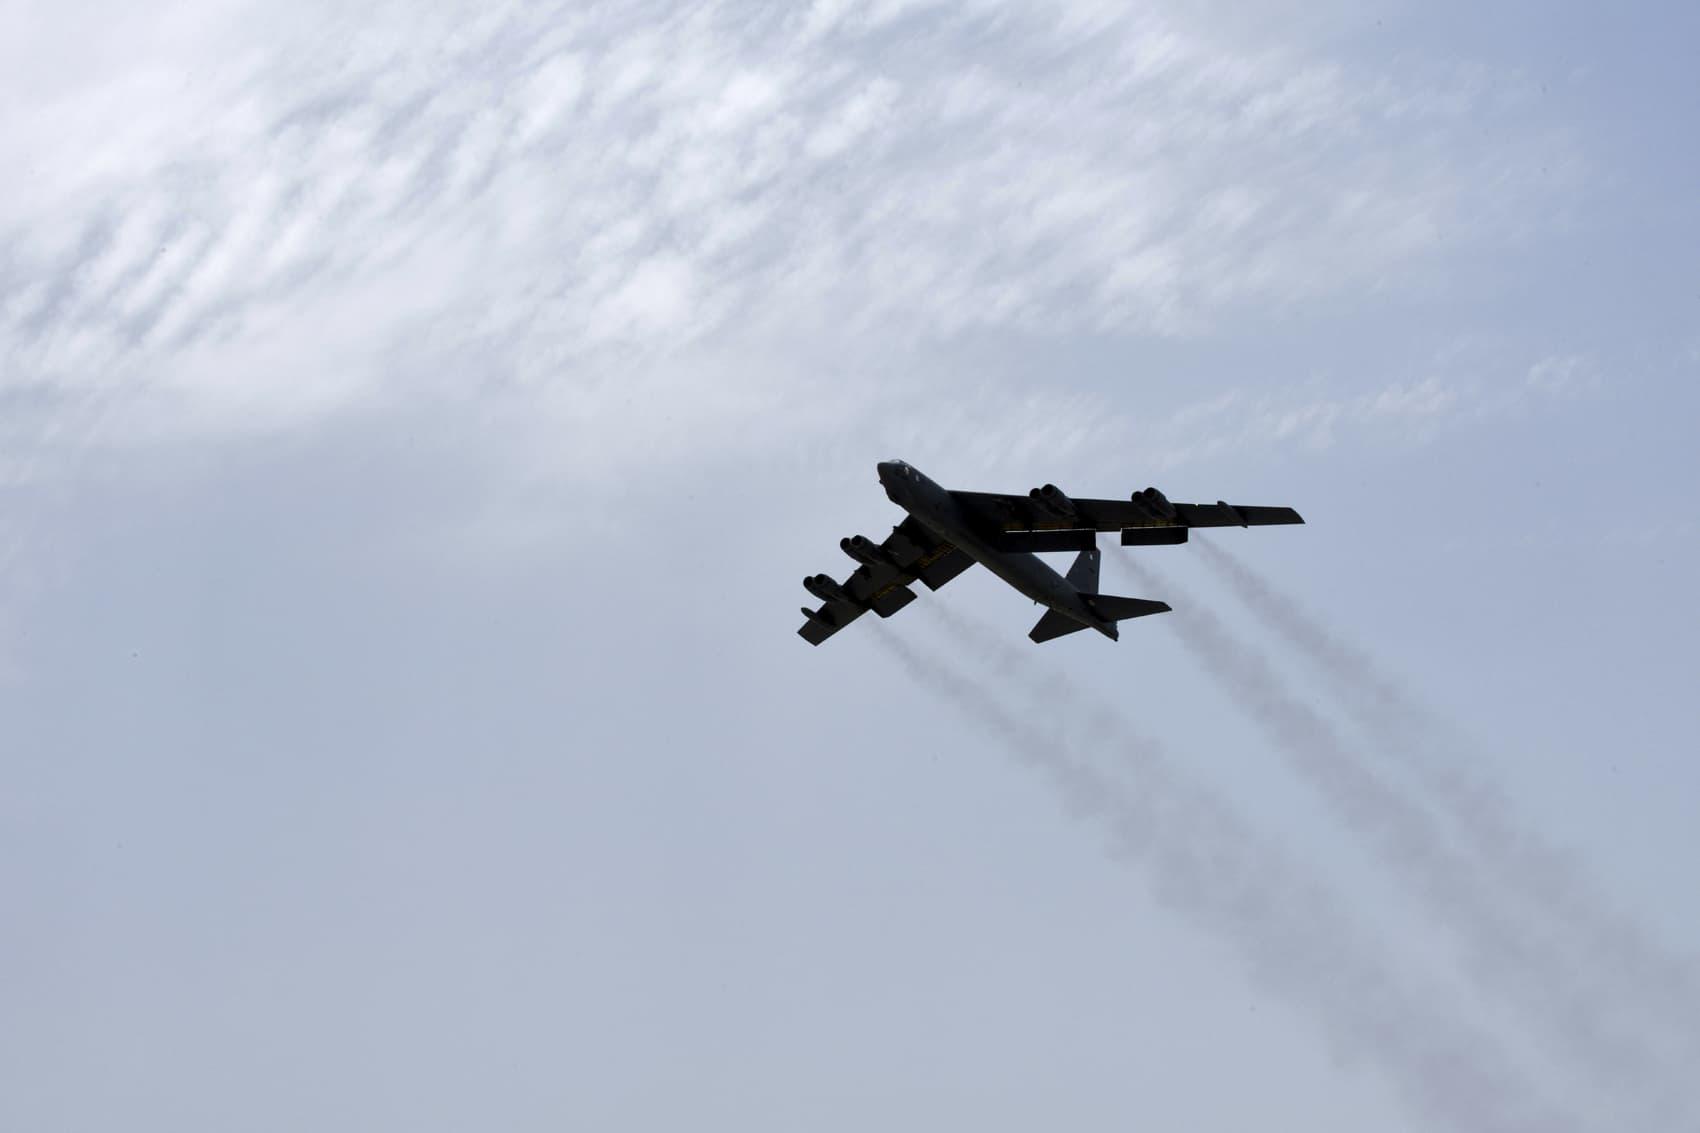 U S -Iran Tensions Soar With Saudi Oil Tankers Attack, White